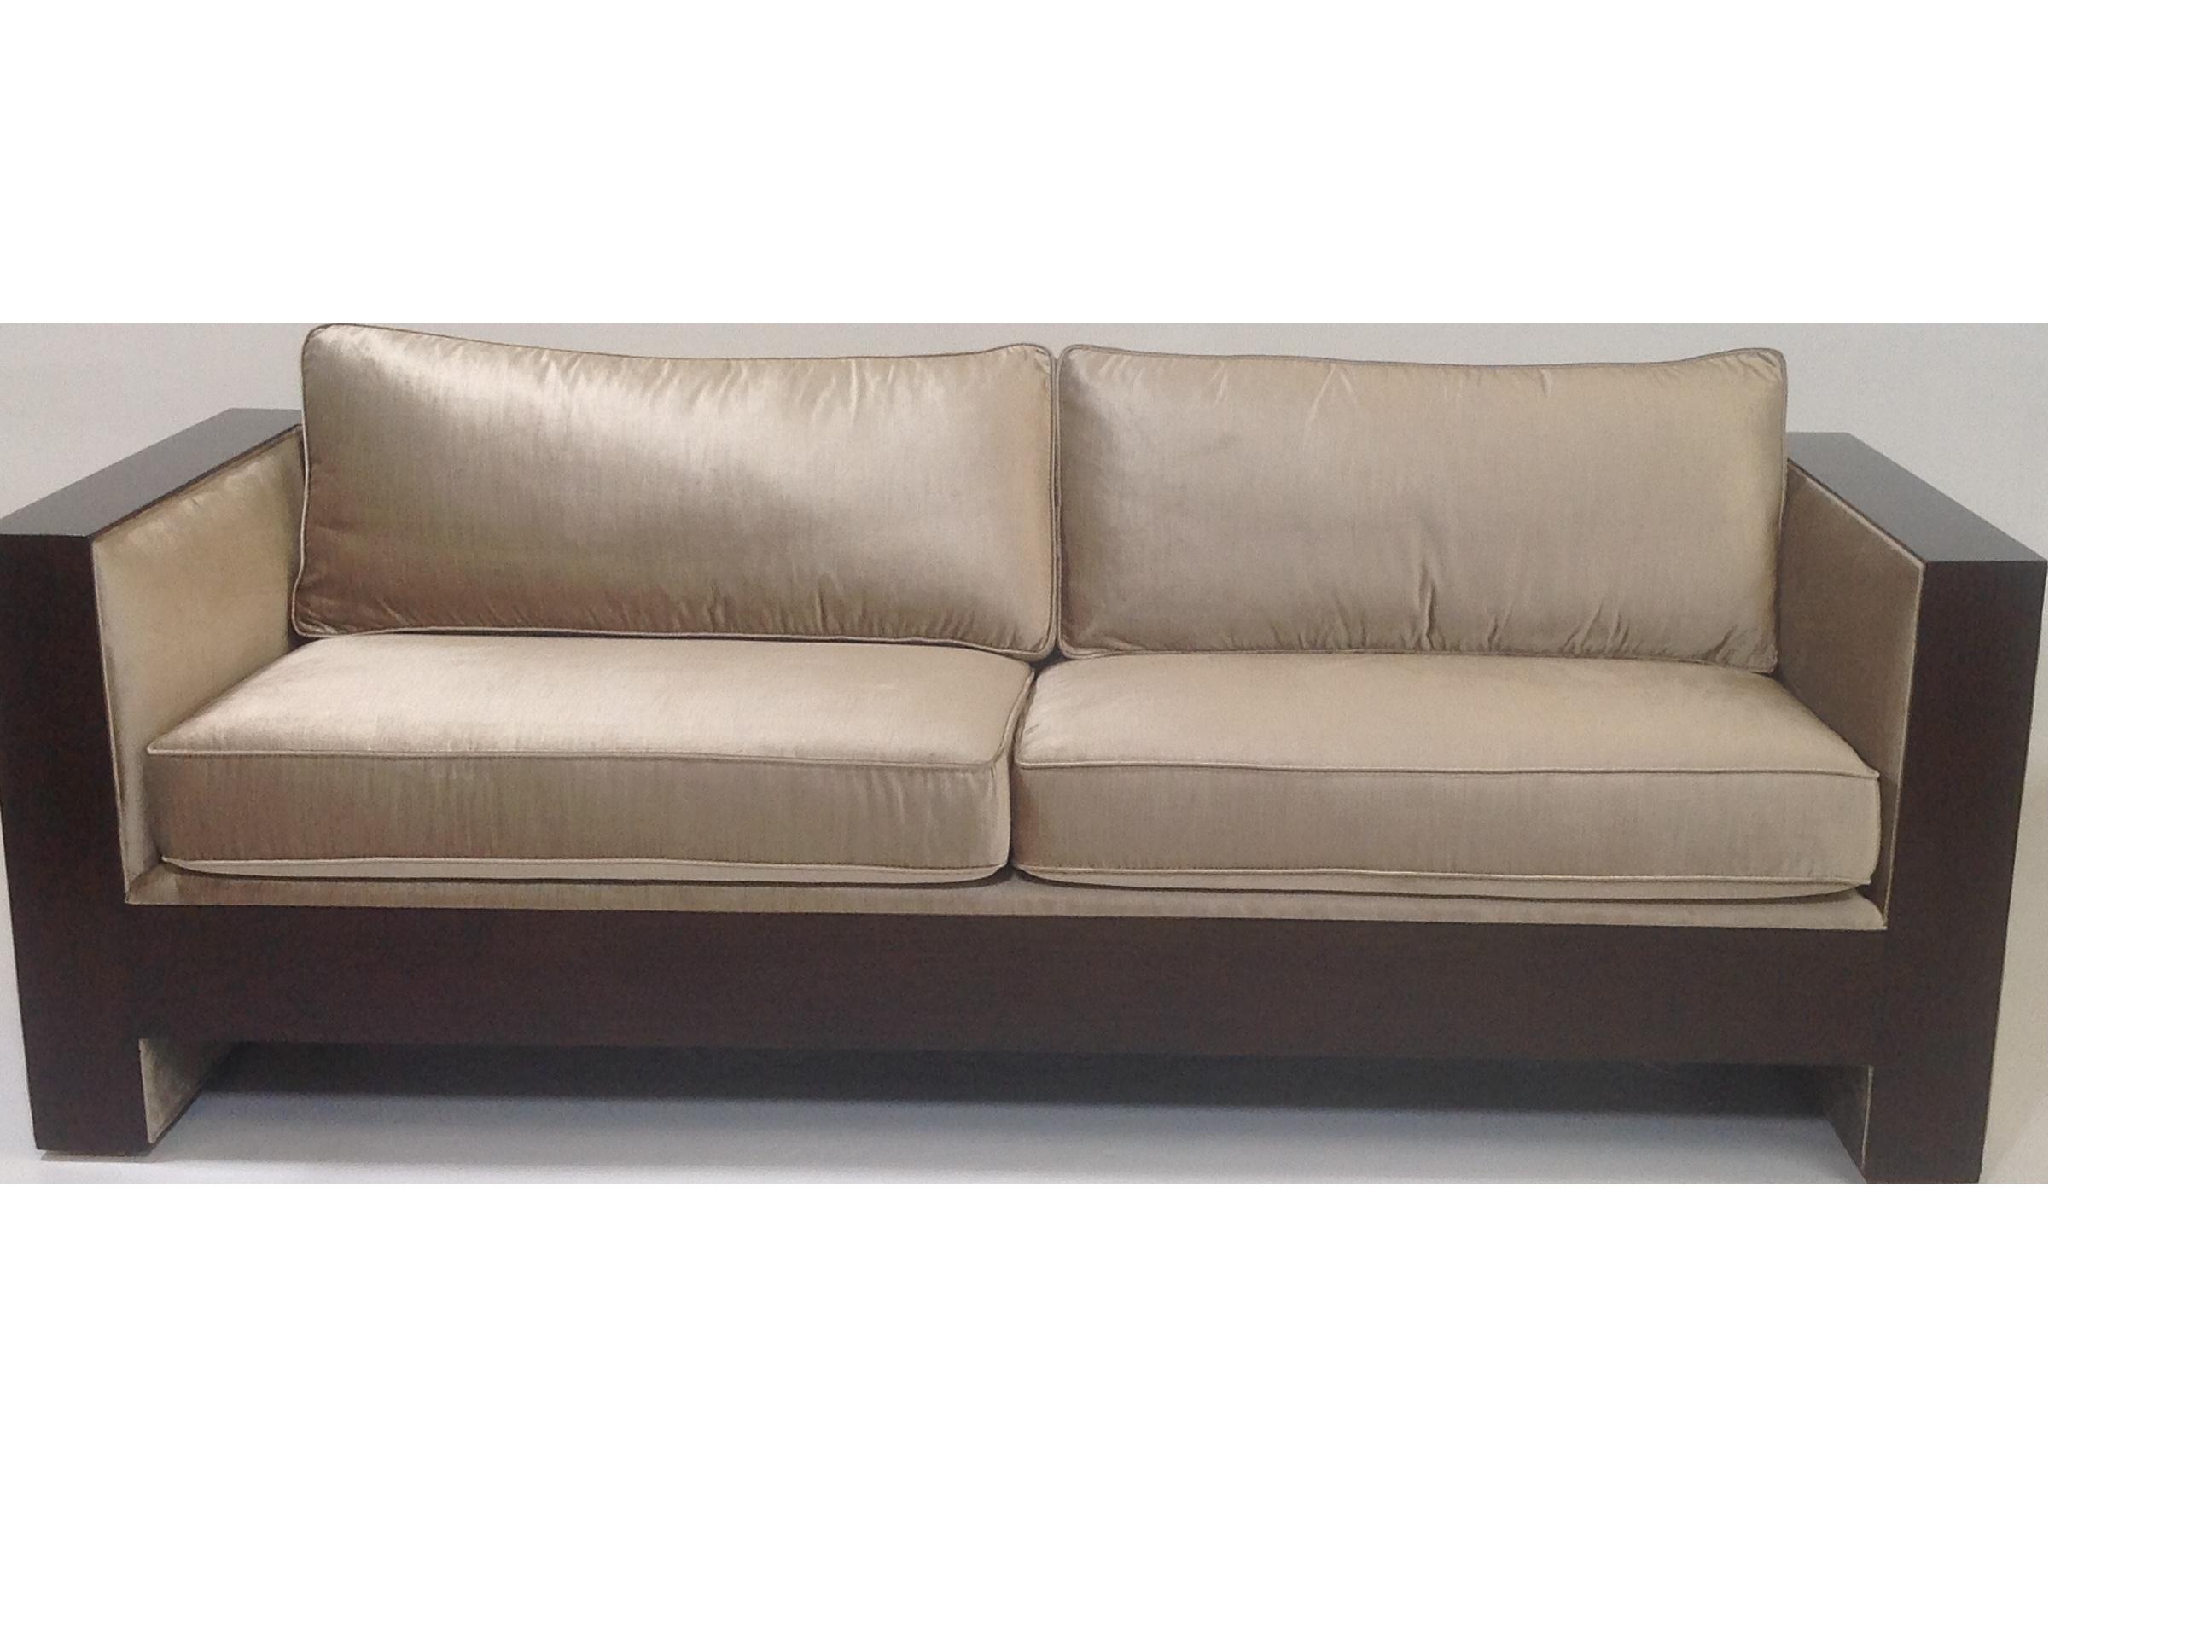 Modern Mid Century Style Cut Velvet Sofa Chairish : 0c5318ad 227e 4a18 870f 4cd4ab88752e from www.chairish.com size 2592 x 1936 png 1743kB